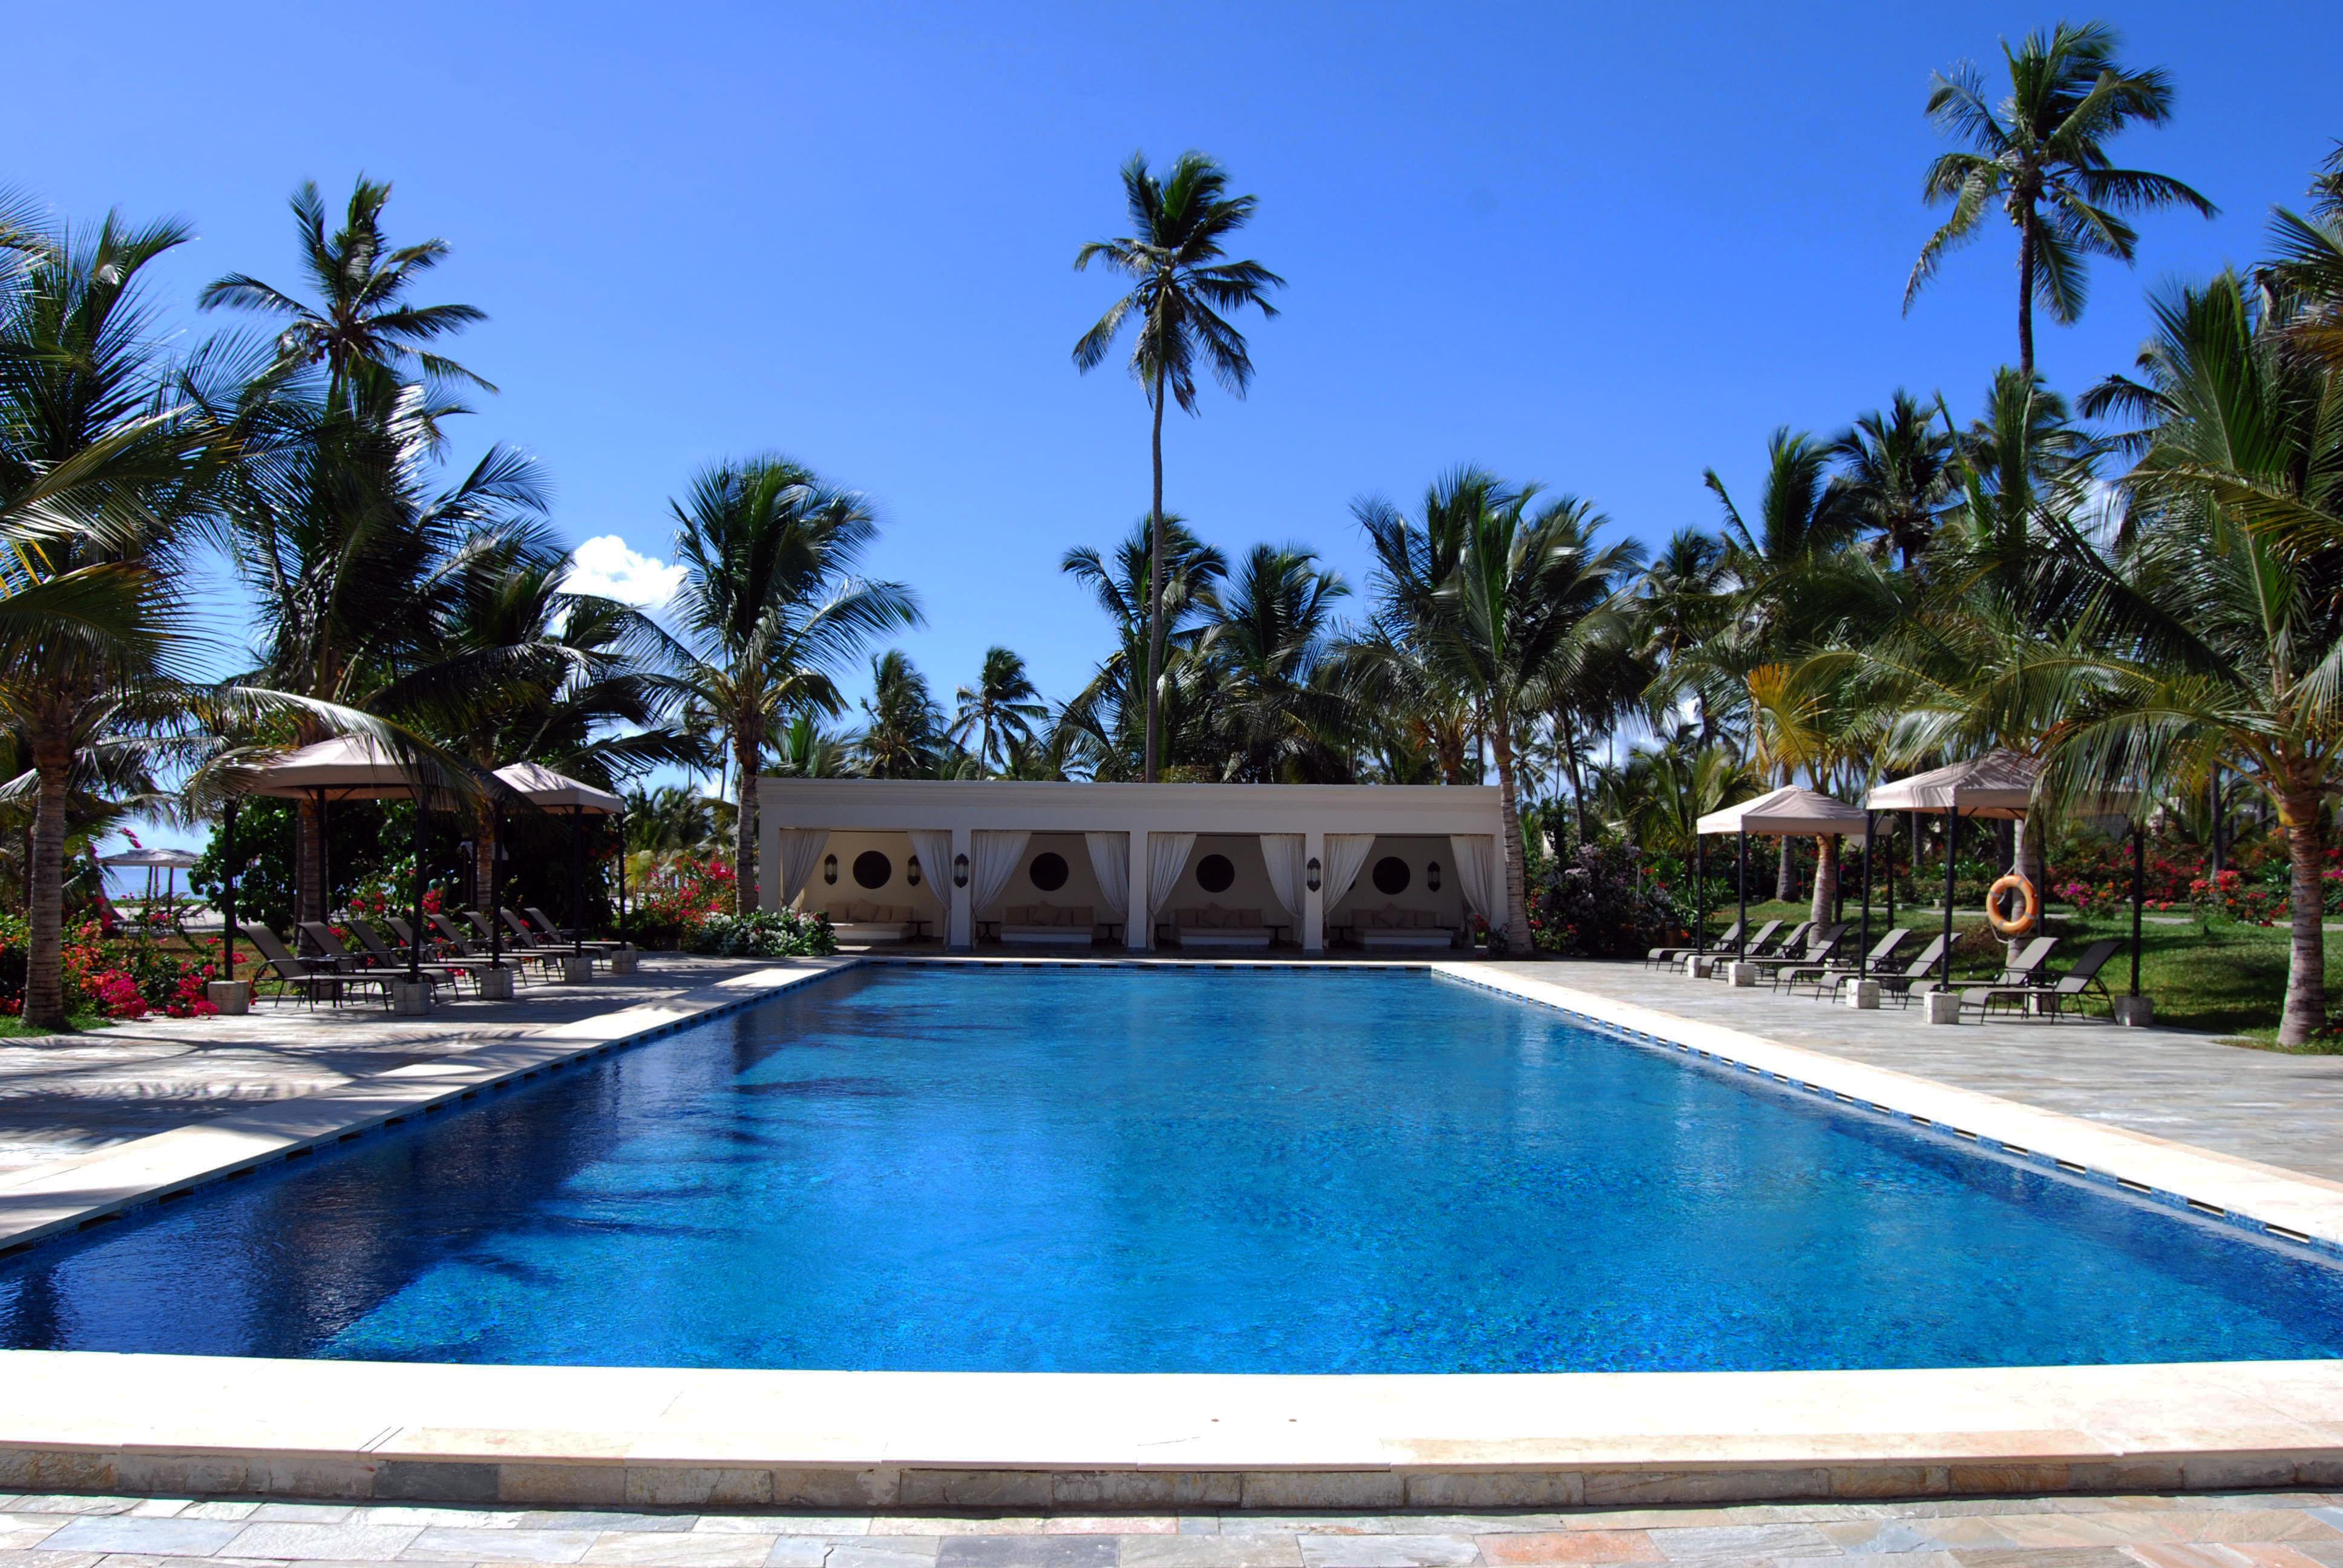 Zanzibar beach hotels and resorts best hotel and resorts for Hotels zanzibar